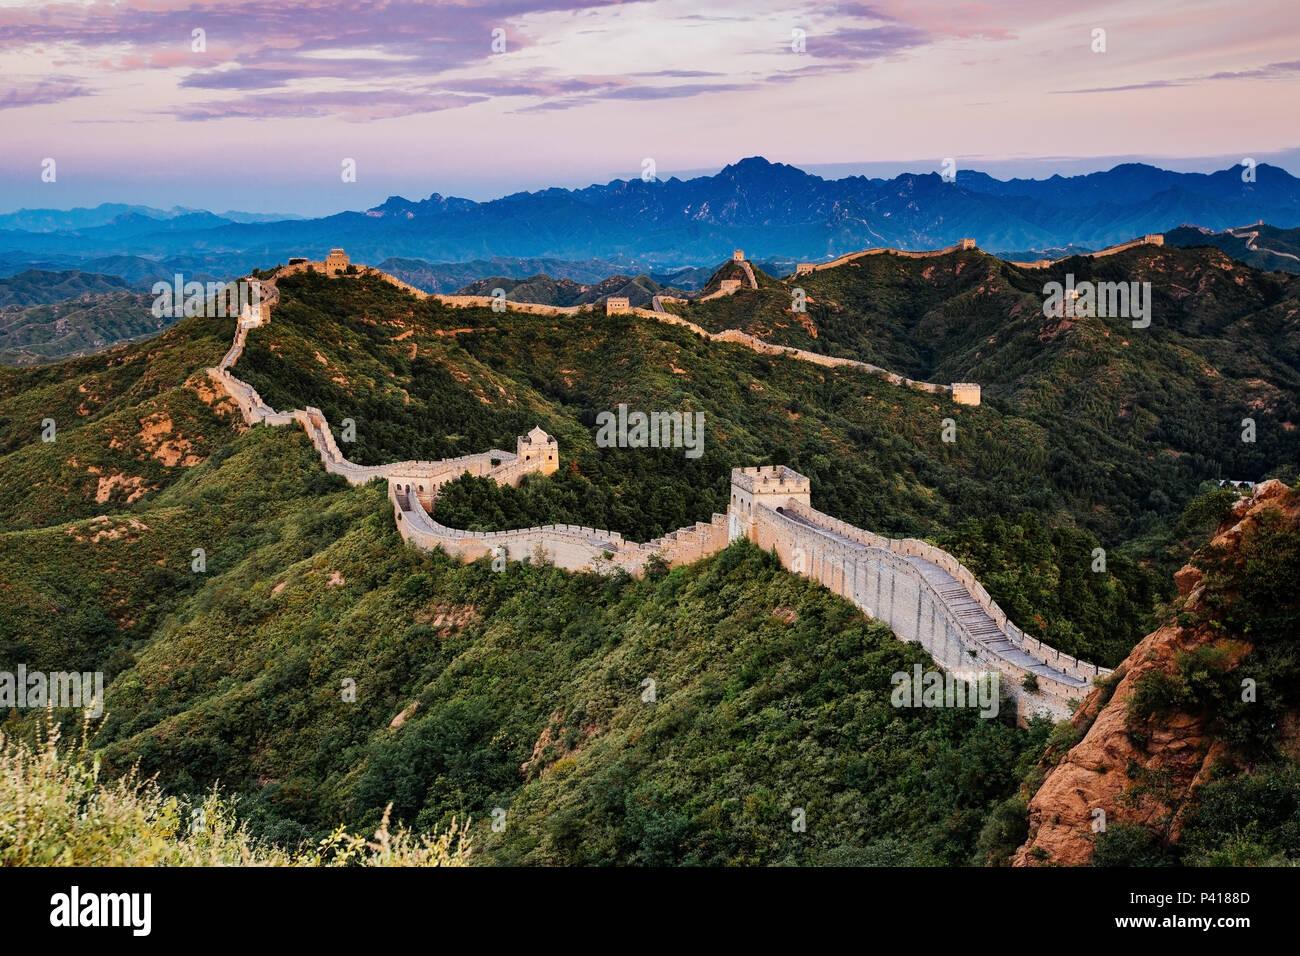 Amanecer en tour caminando Jinshanling Gran Muralla de China, tour caminando Jinshanling, Beijing, China Foto de stock